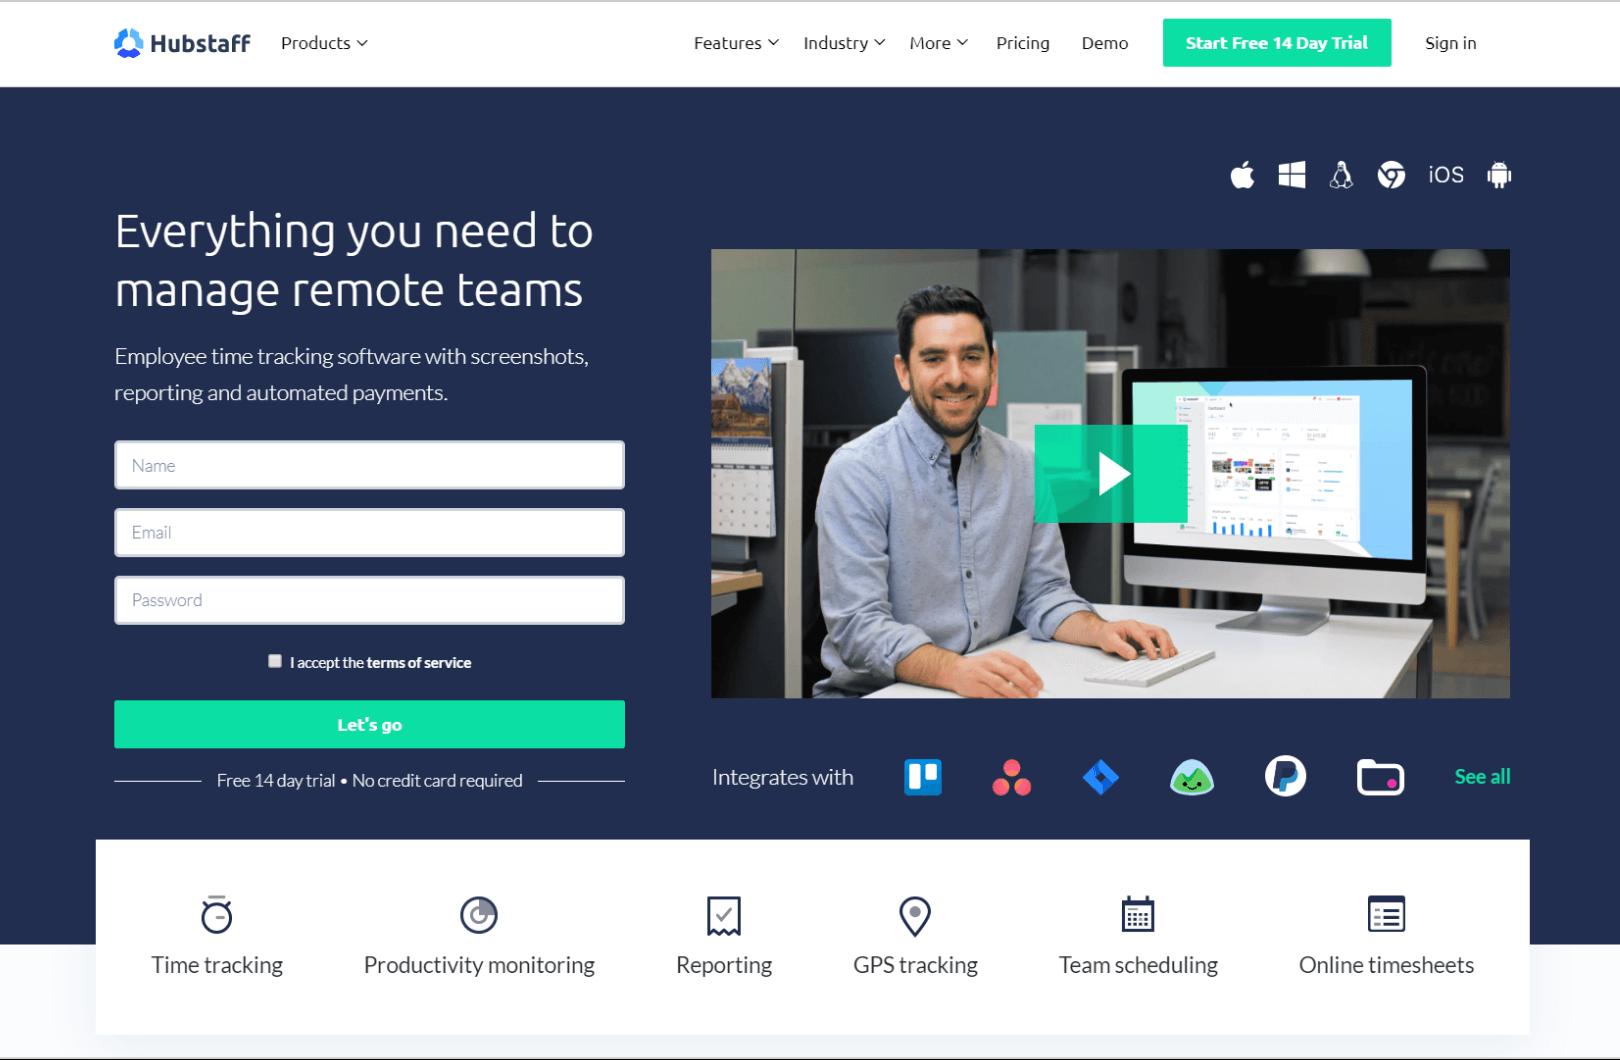 Hubstaff homepage